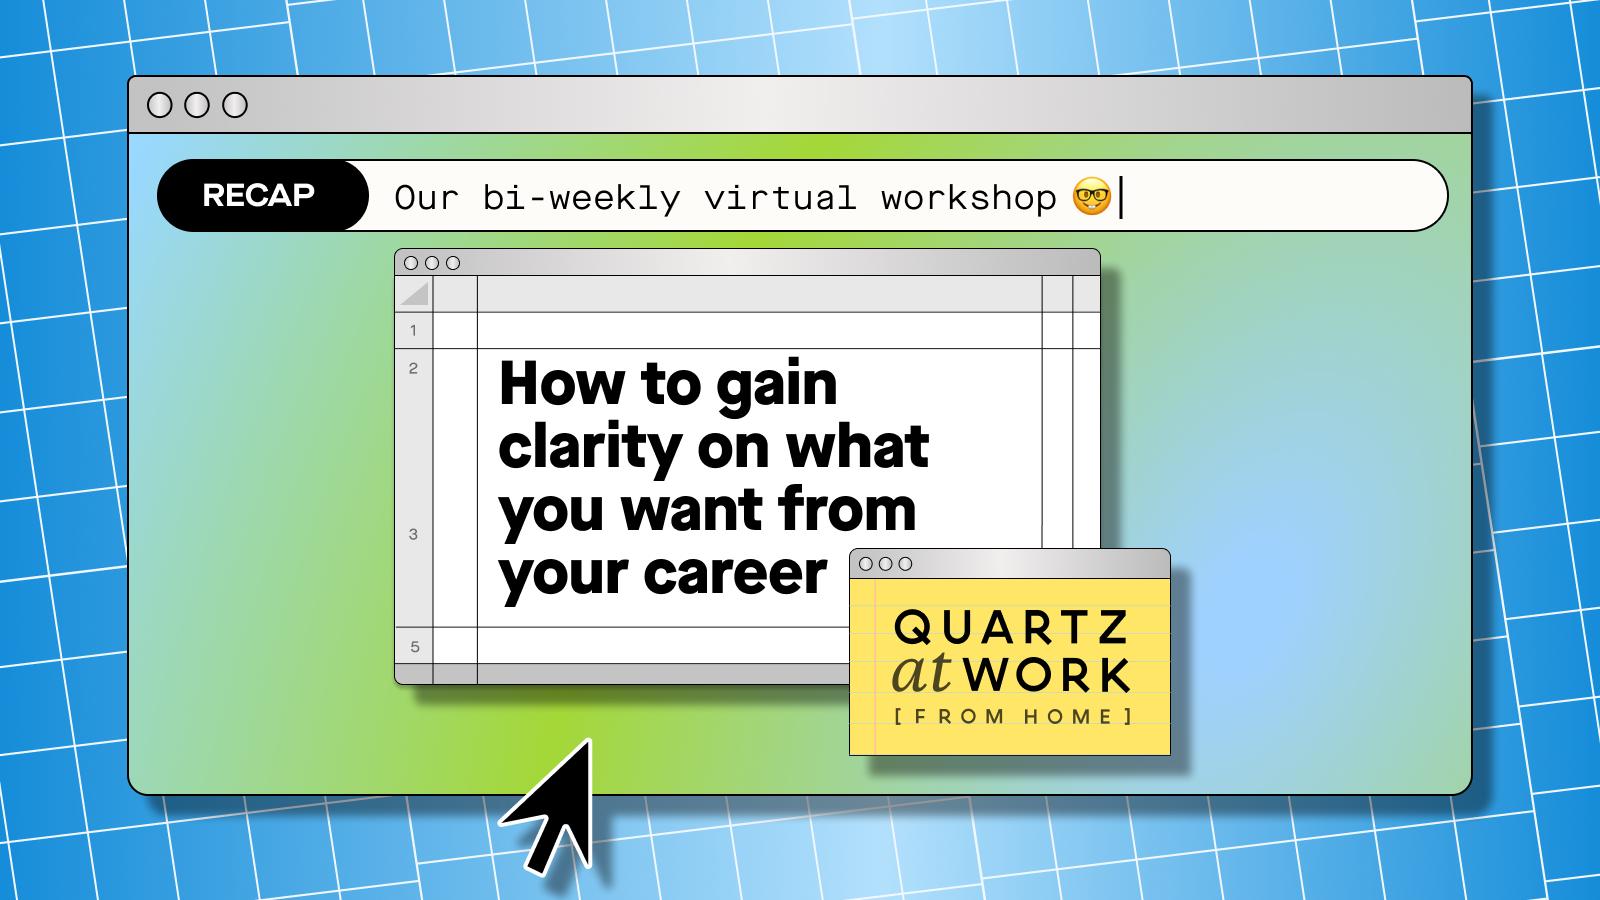 Quartz at Work (from home) workshop recap logo